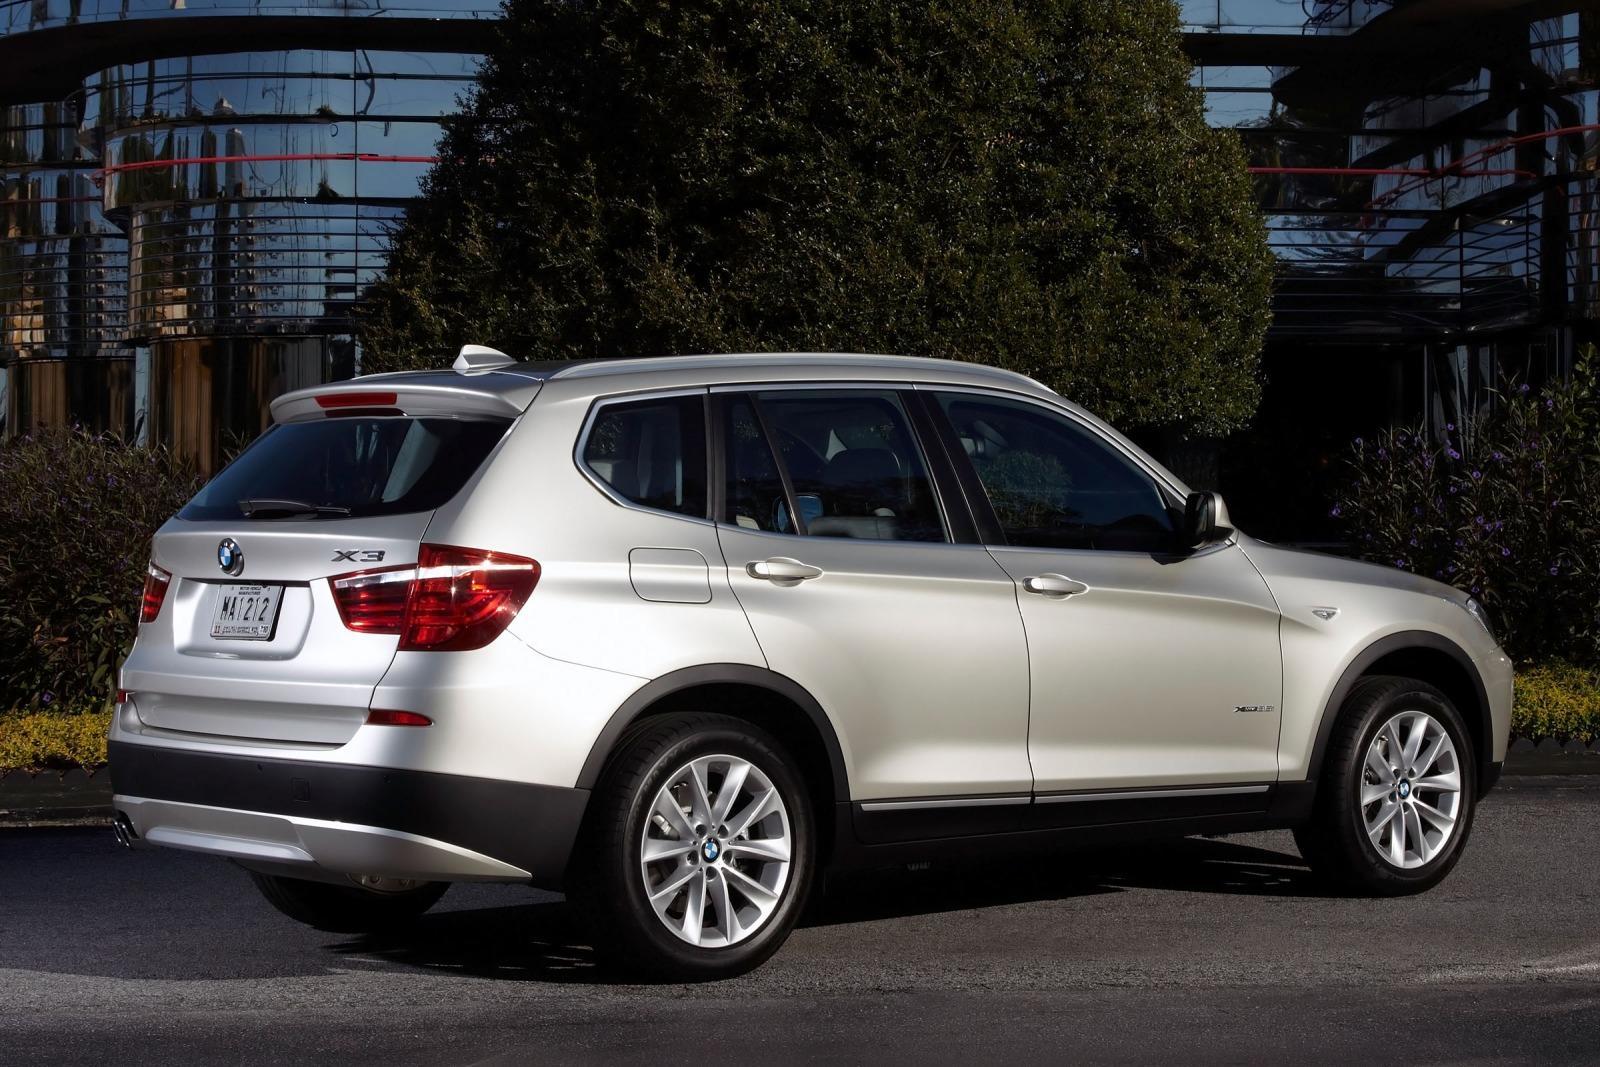 2012 bmw x3 xdrive35i 4dr interior 8 800 1024 1280 1600 origin